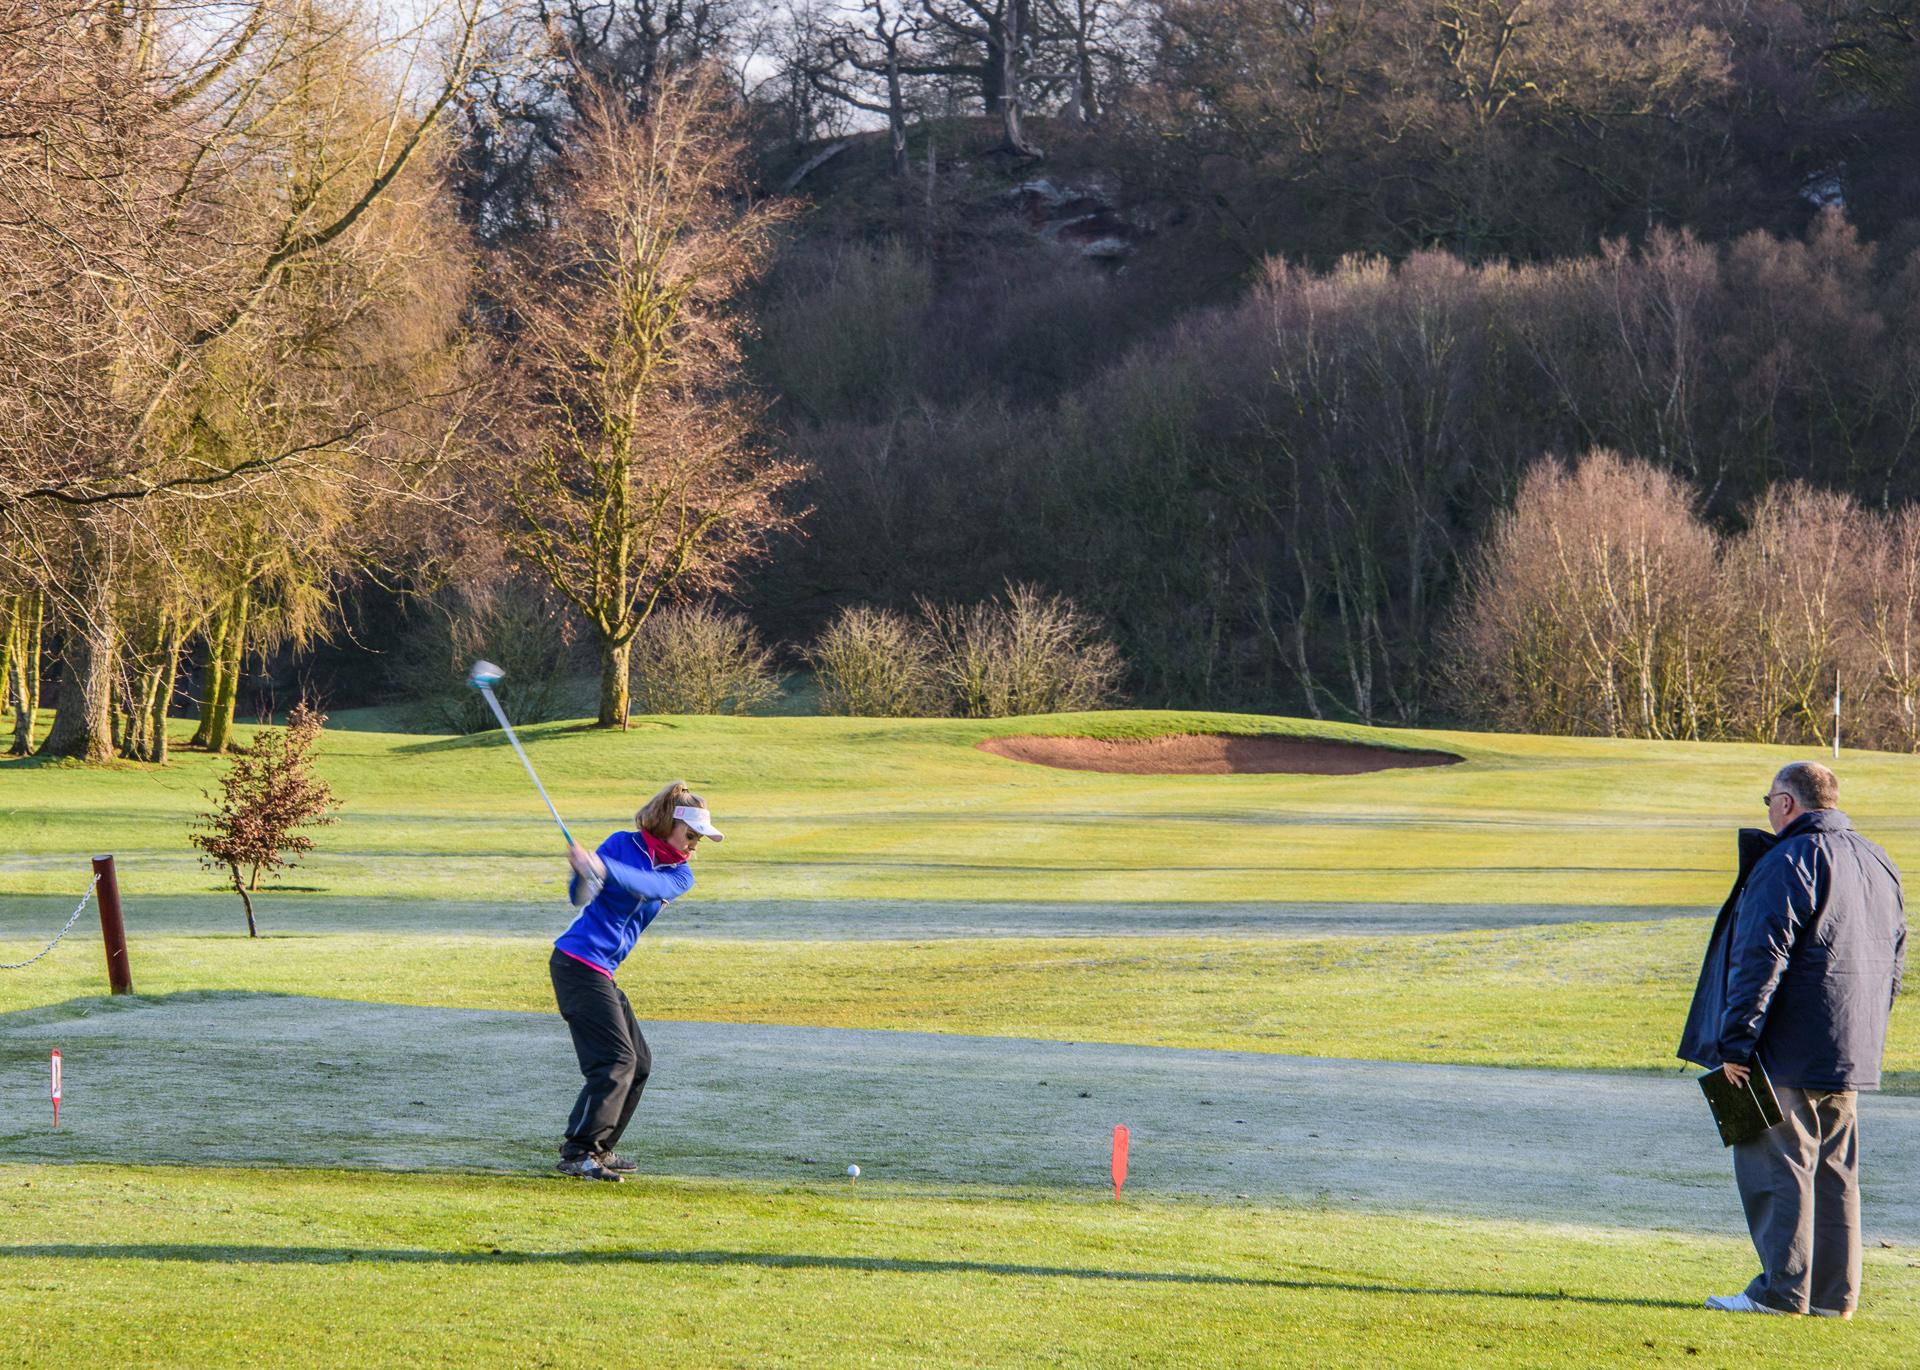 Kevindiss.com golf course photography Hawkstone Park golf course-2233-2.jpg